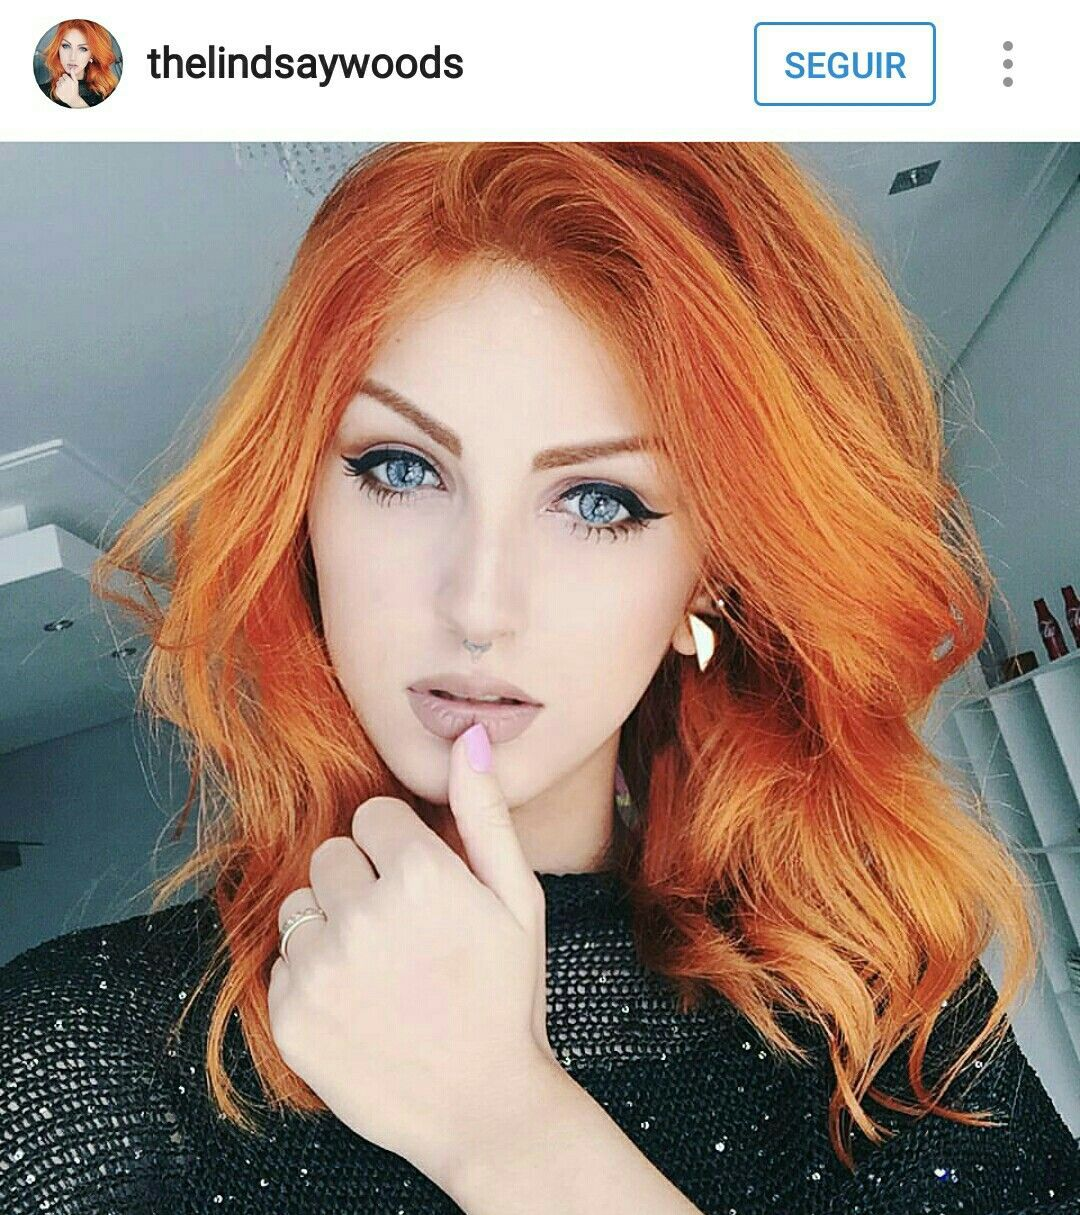 Lindsey Woods